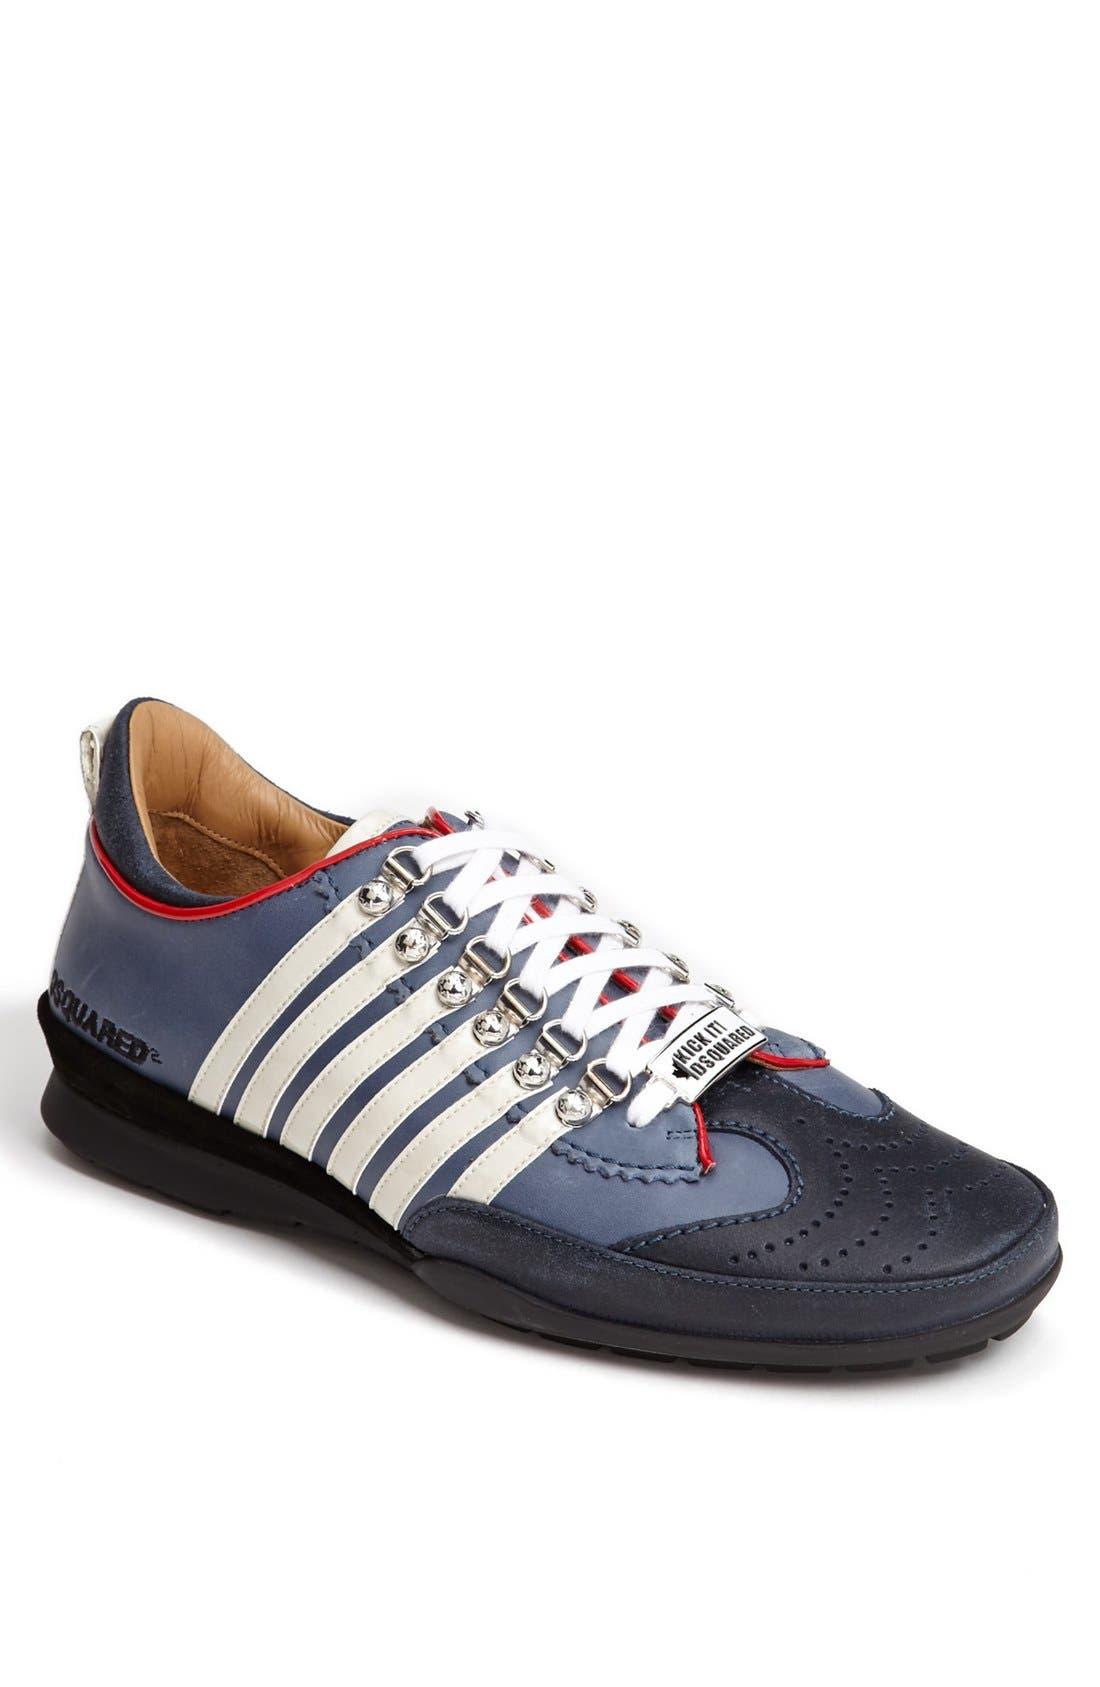 Alternate Image 1 Selected - Dsquared2 '251' Sneaker